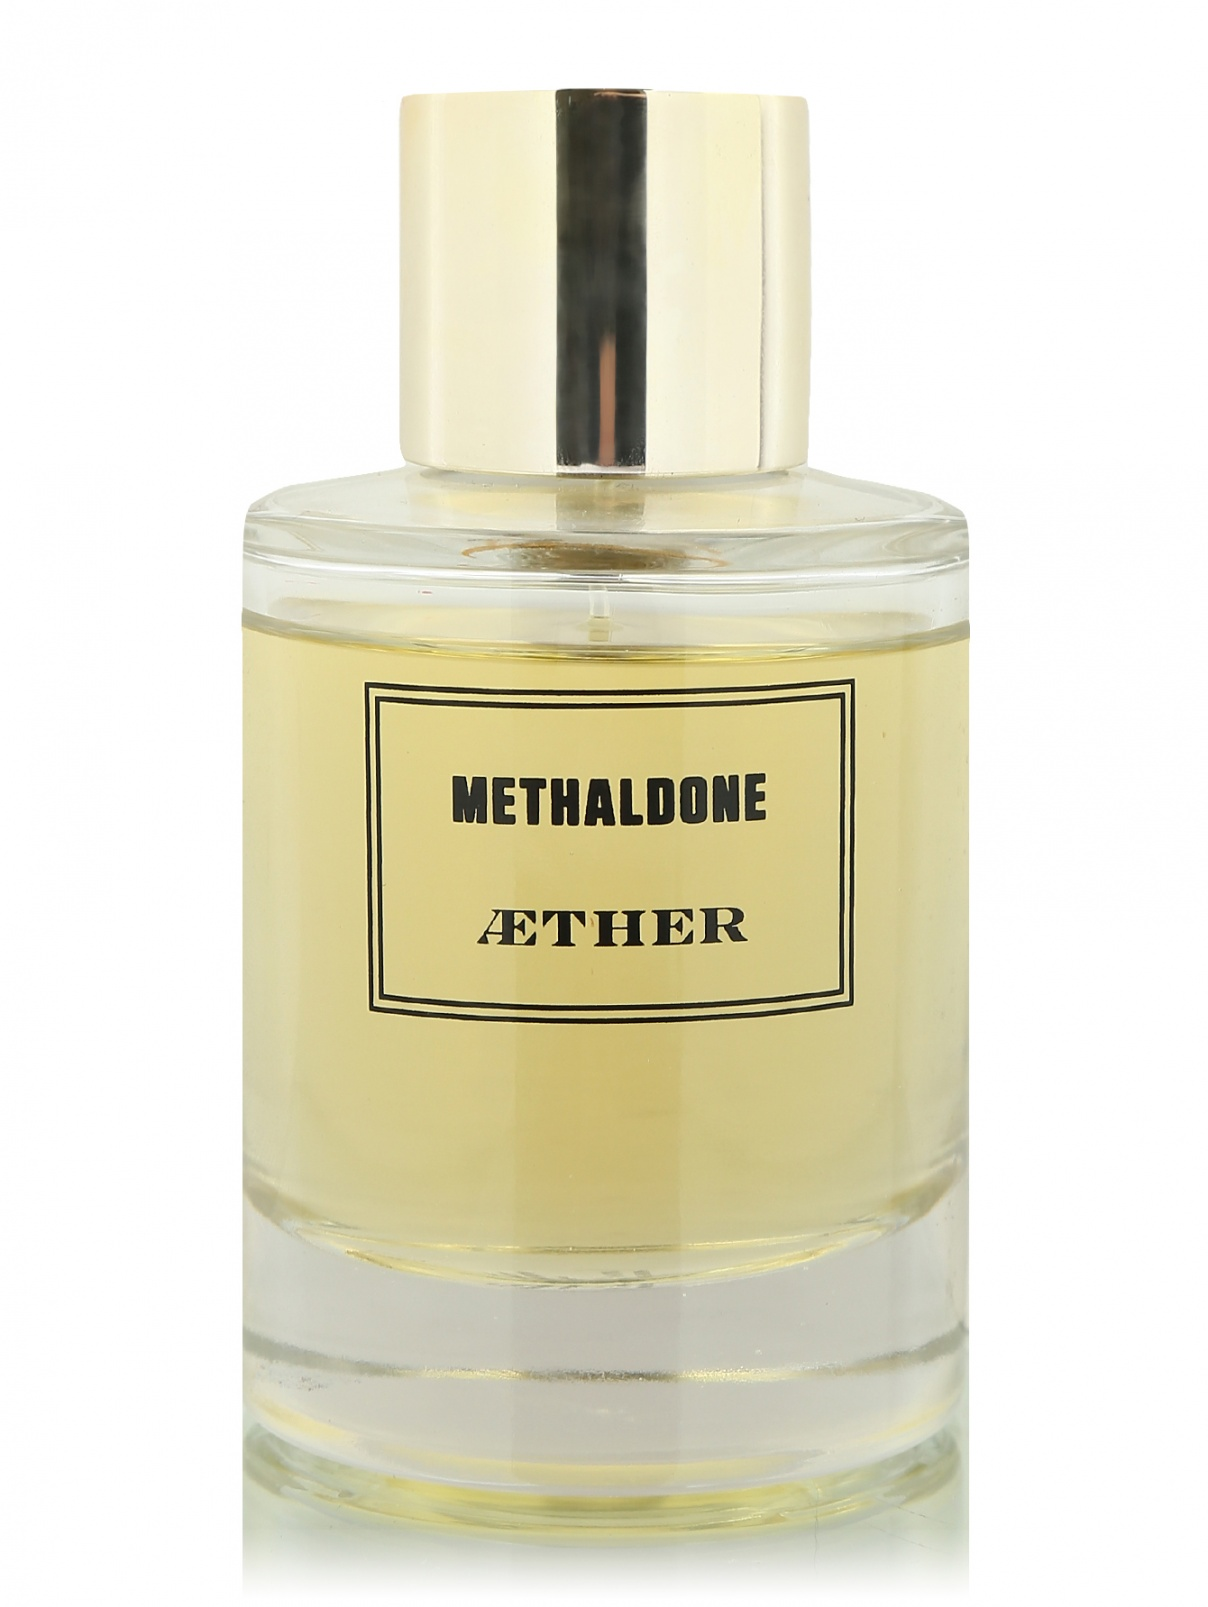 Парфюмерная вода 100 мл Methaldone Aether  –  Общий вид